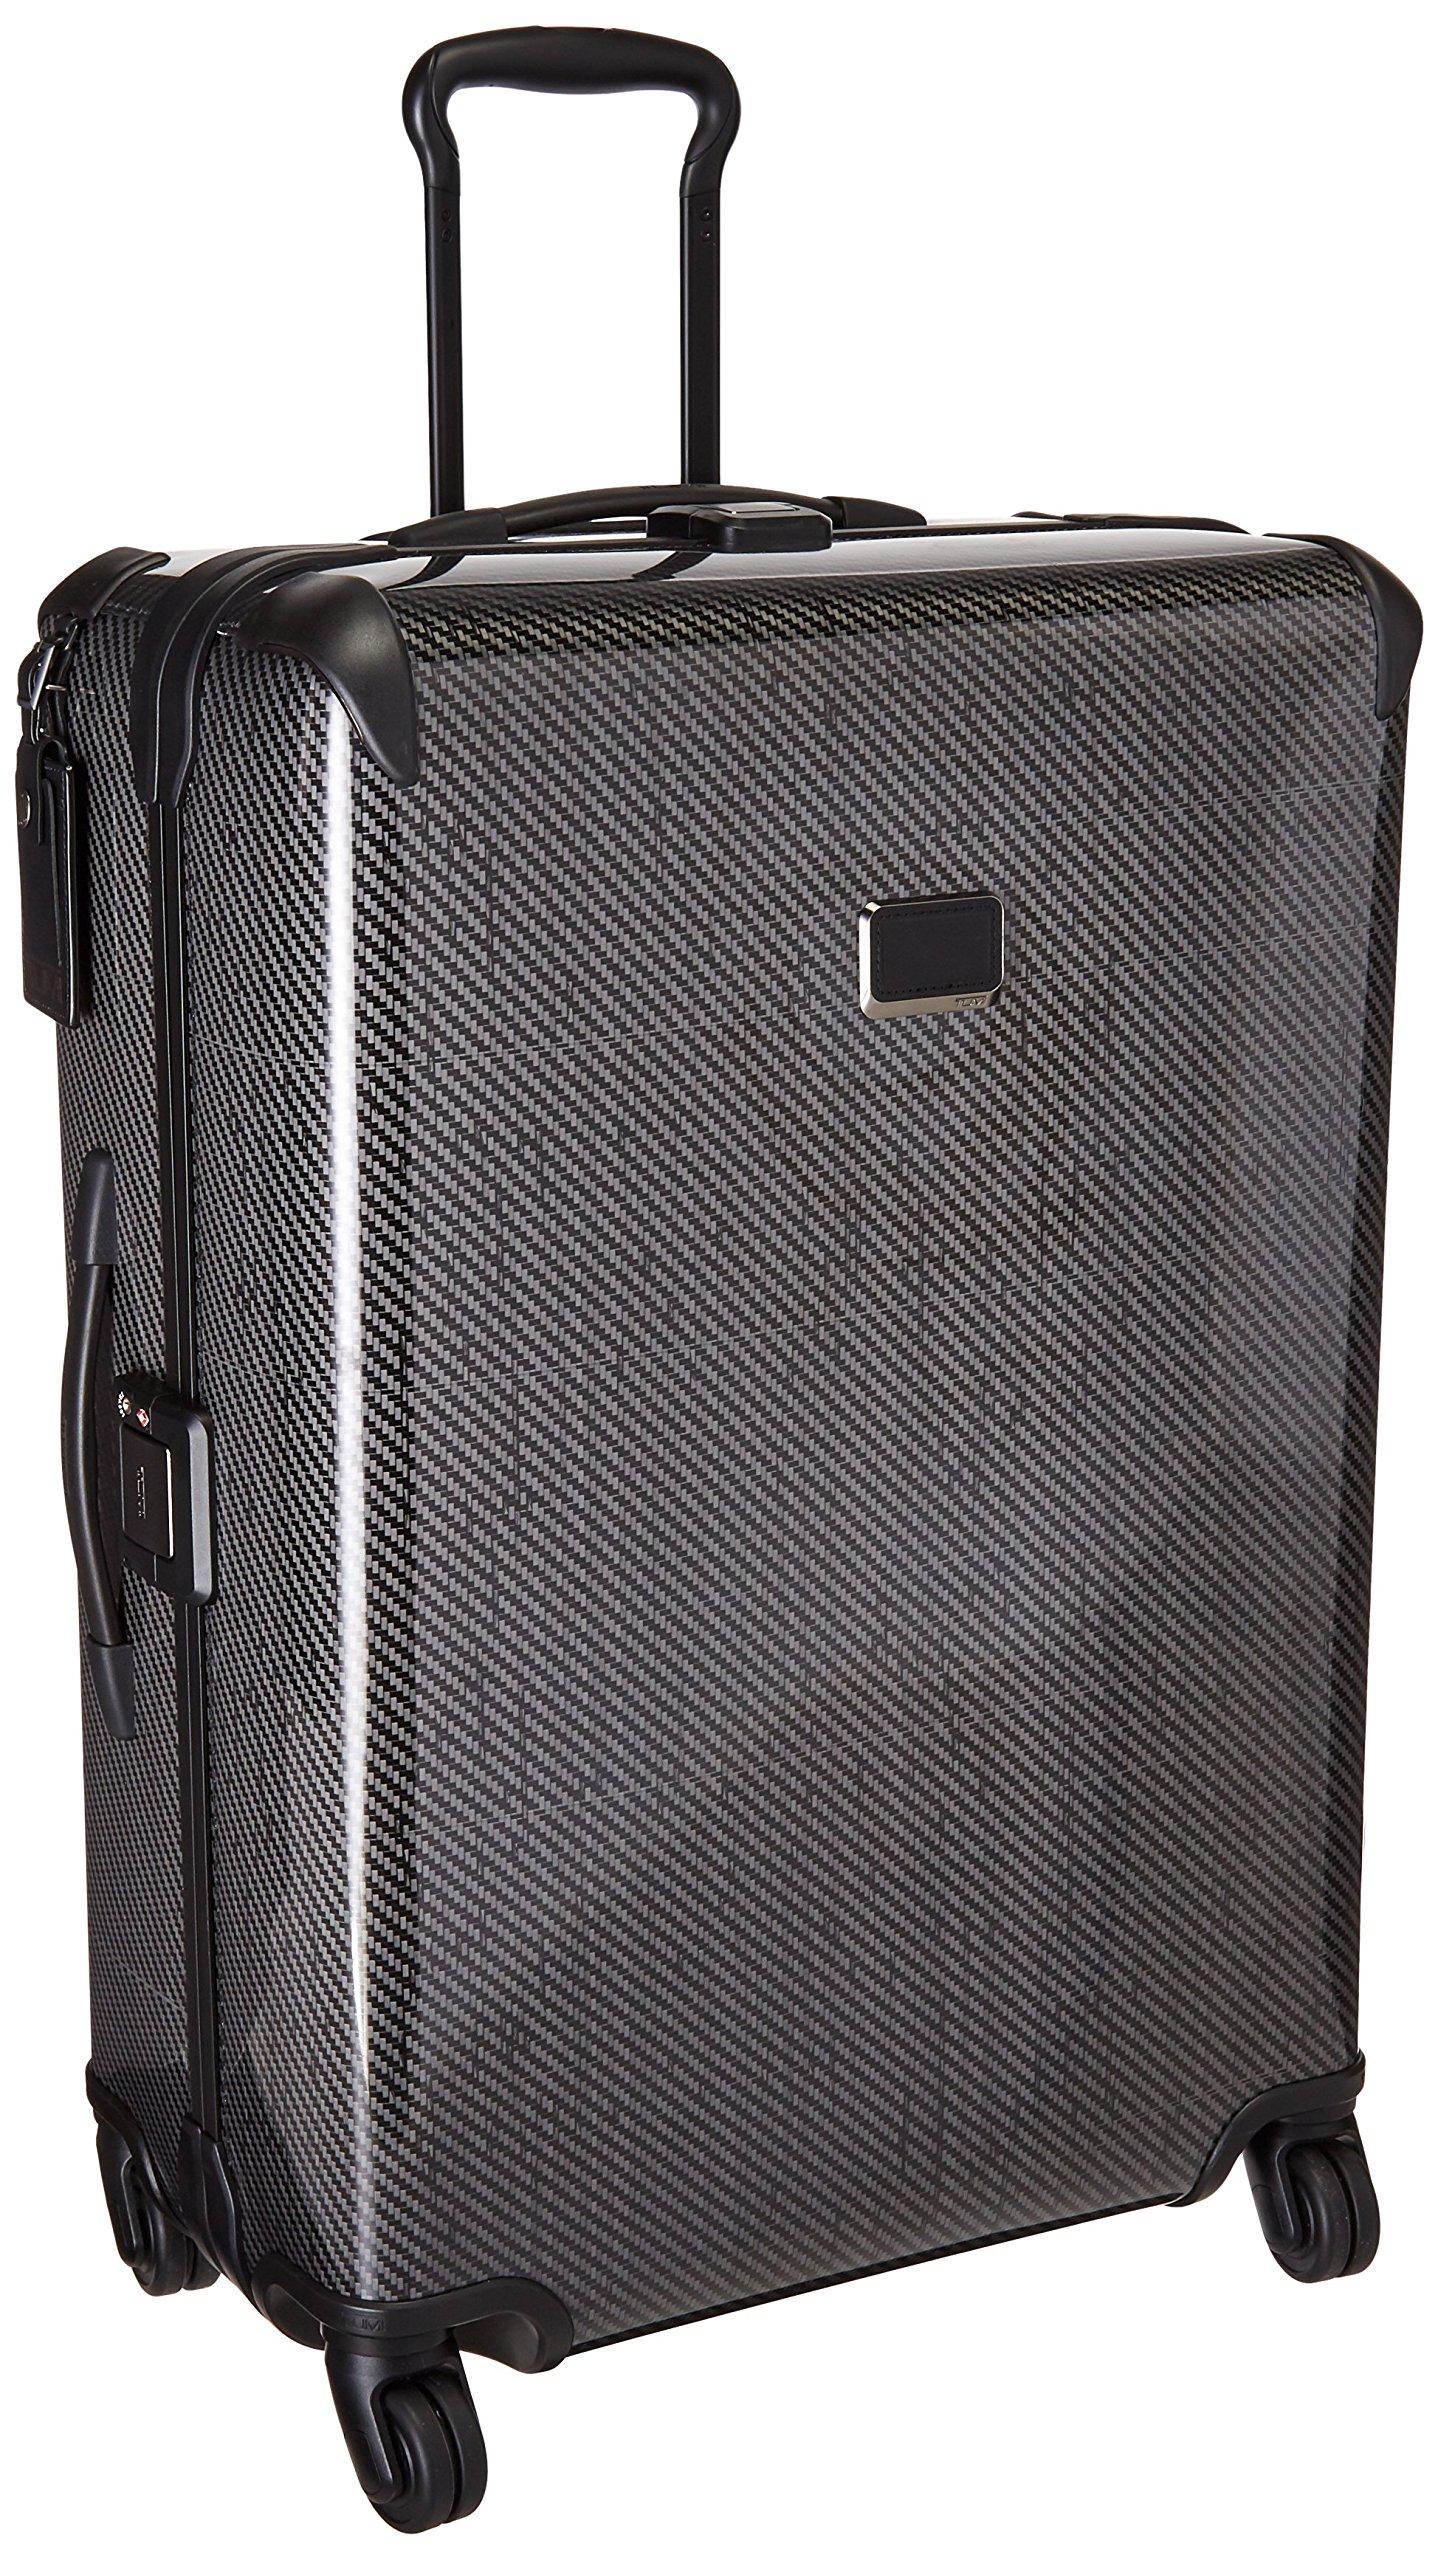 Tumi Tegra-Lite X Frame Large Trip Packing Case, Black Graphite by Tumi